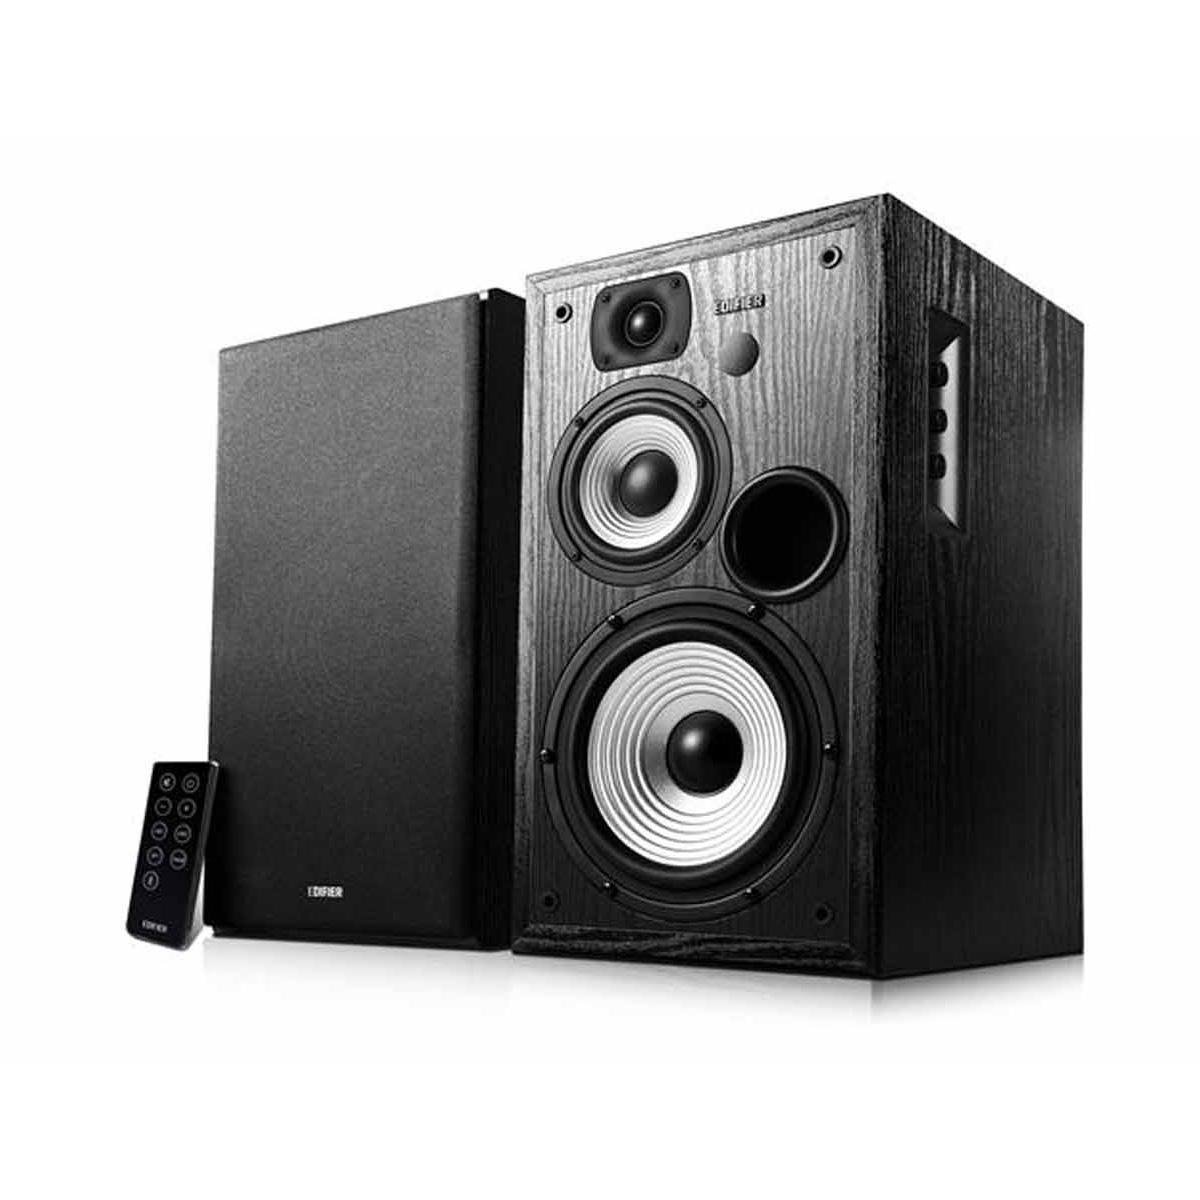 Edifier Studio R2730DB 2.0 Bluetooth Speakers/ 136W RMS/ Remote Control/ Bluetooth, Dual Digital (Optical) and Analogue (RCA) Audio Inputs datoru skaļruņi